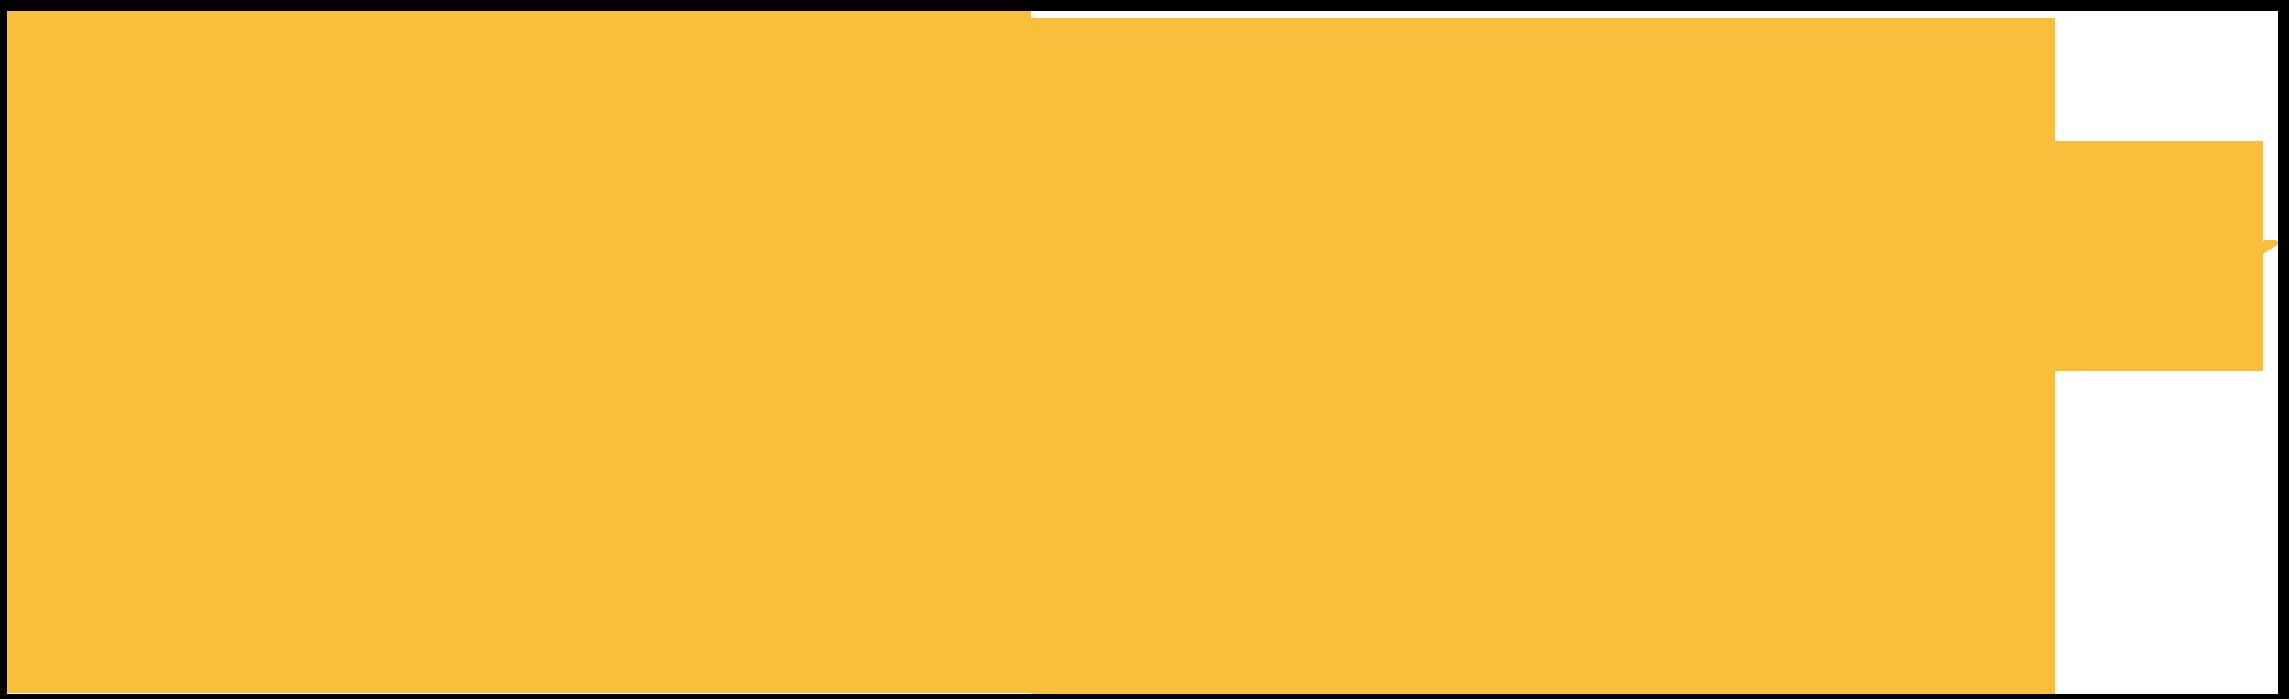 Shuler Association Management